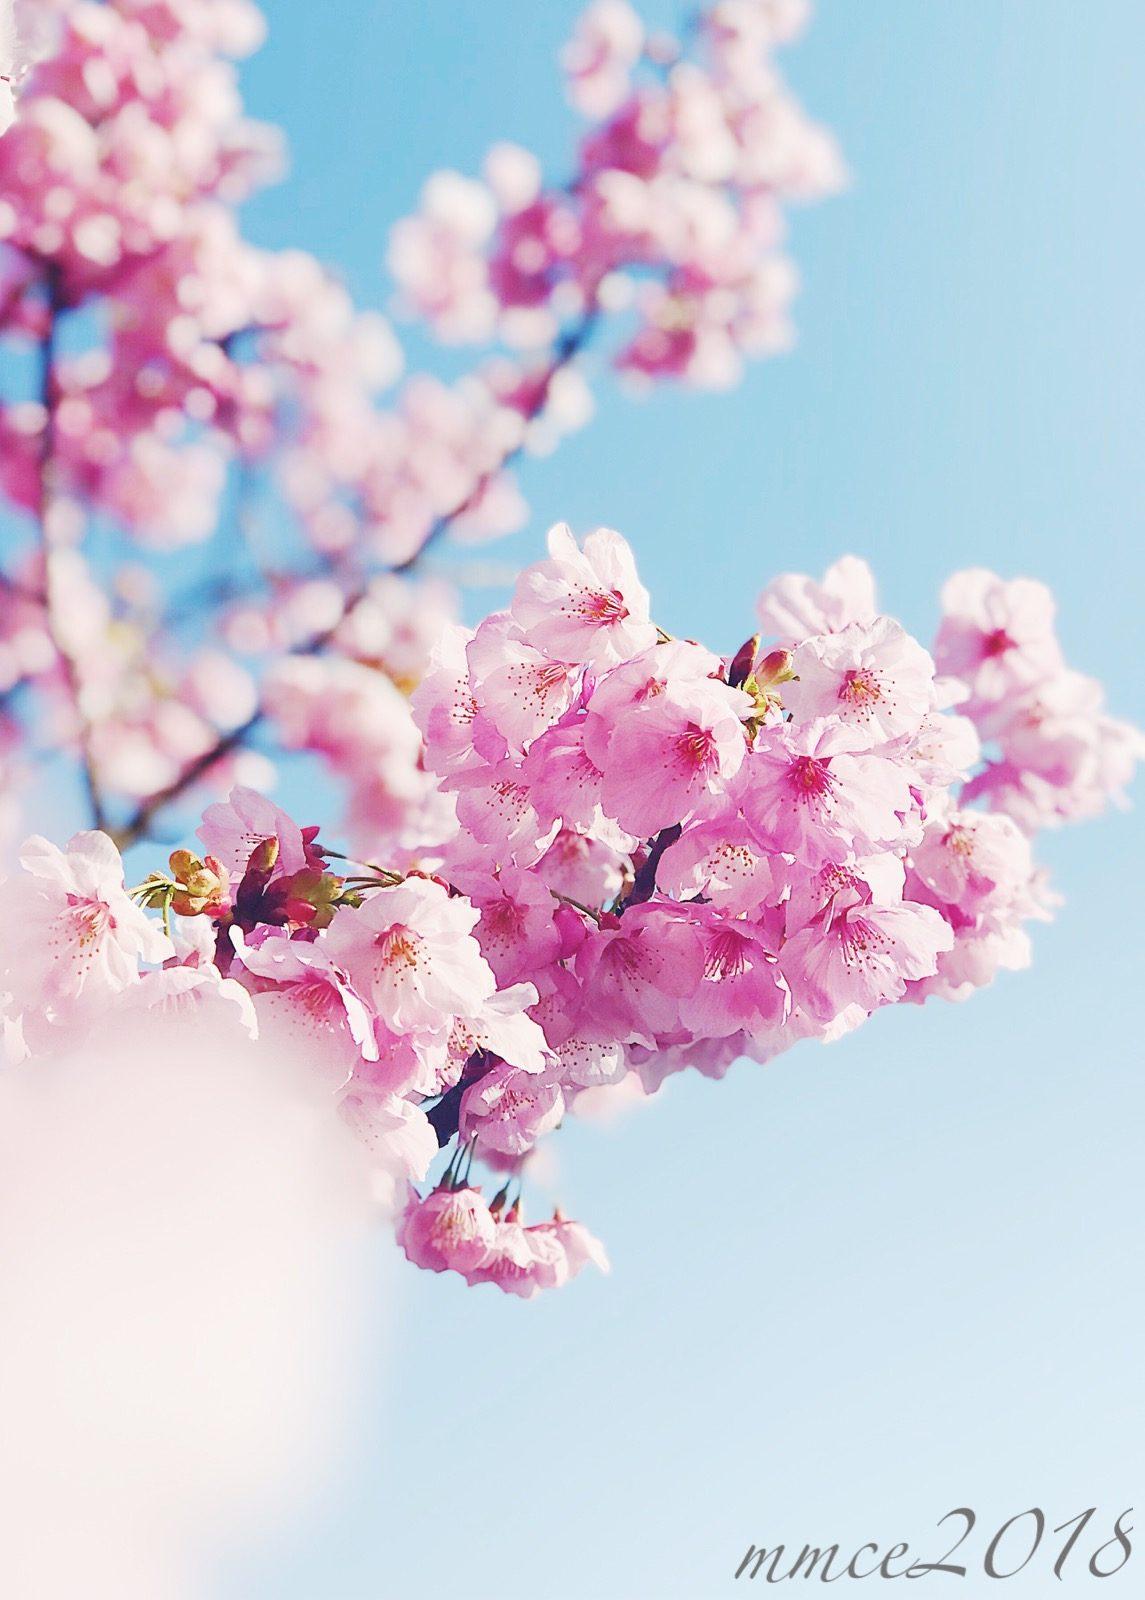 In Full Bloom – Mai Estarez